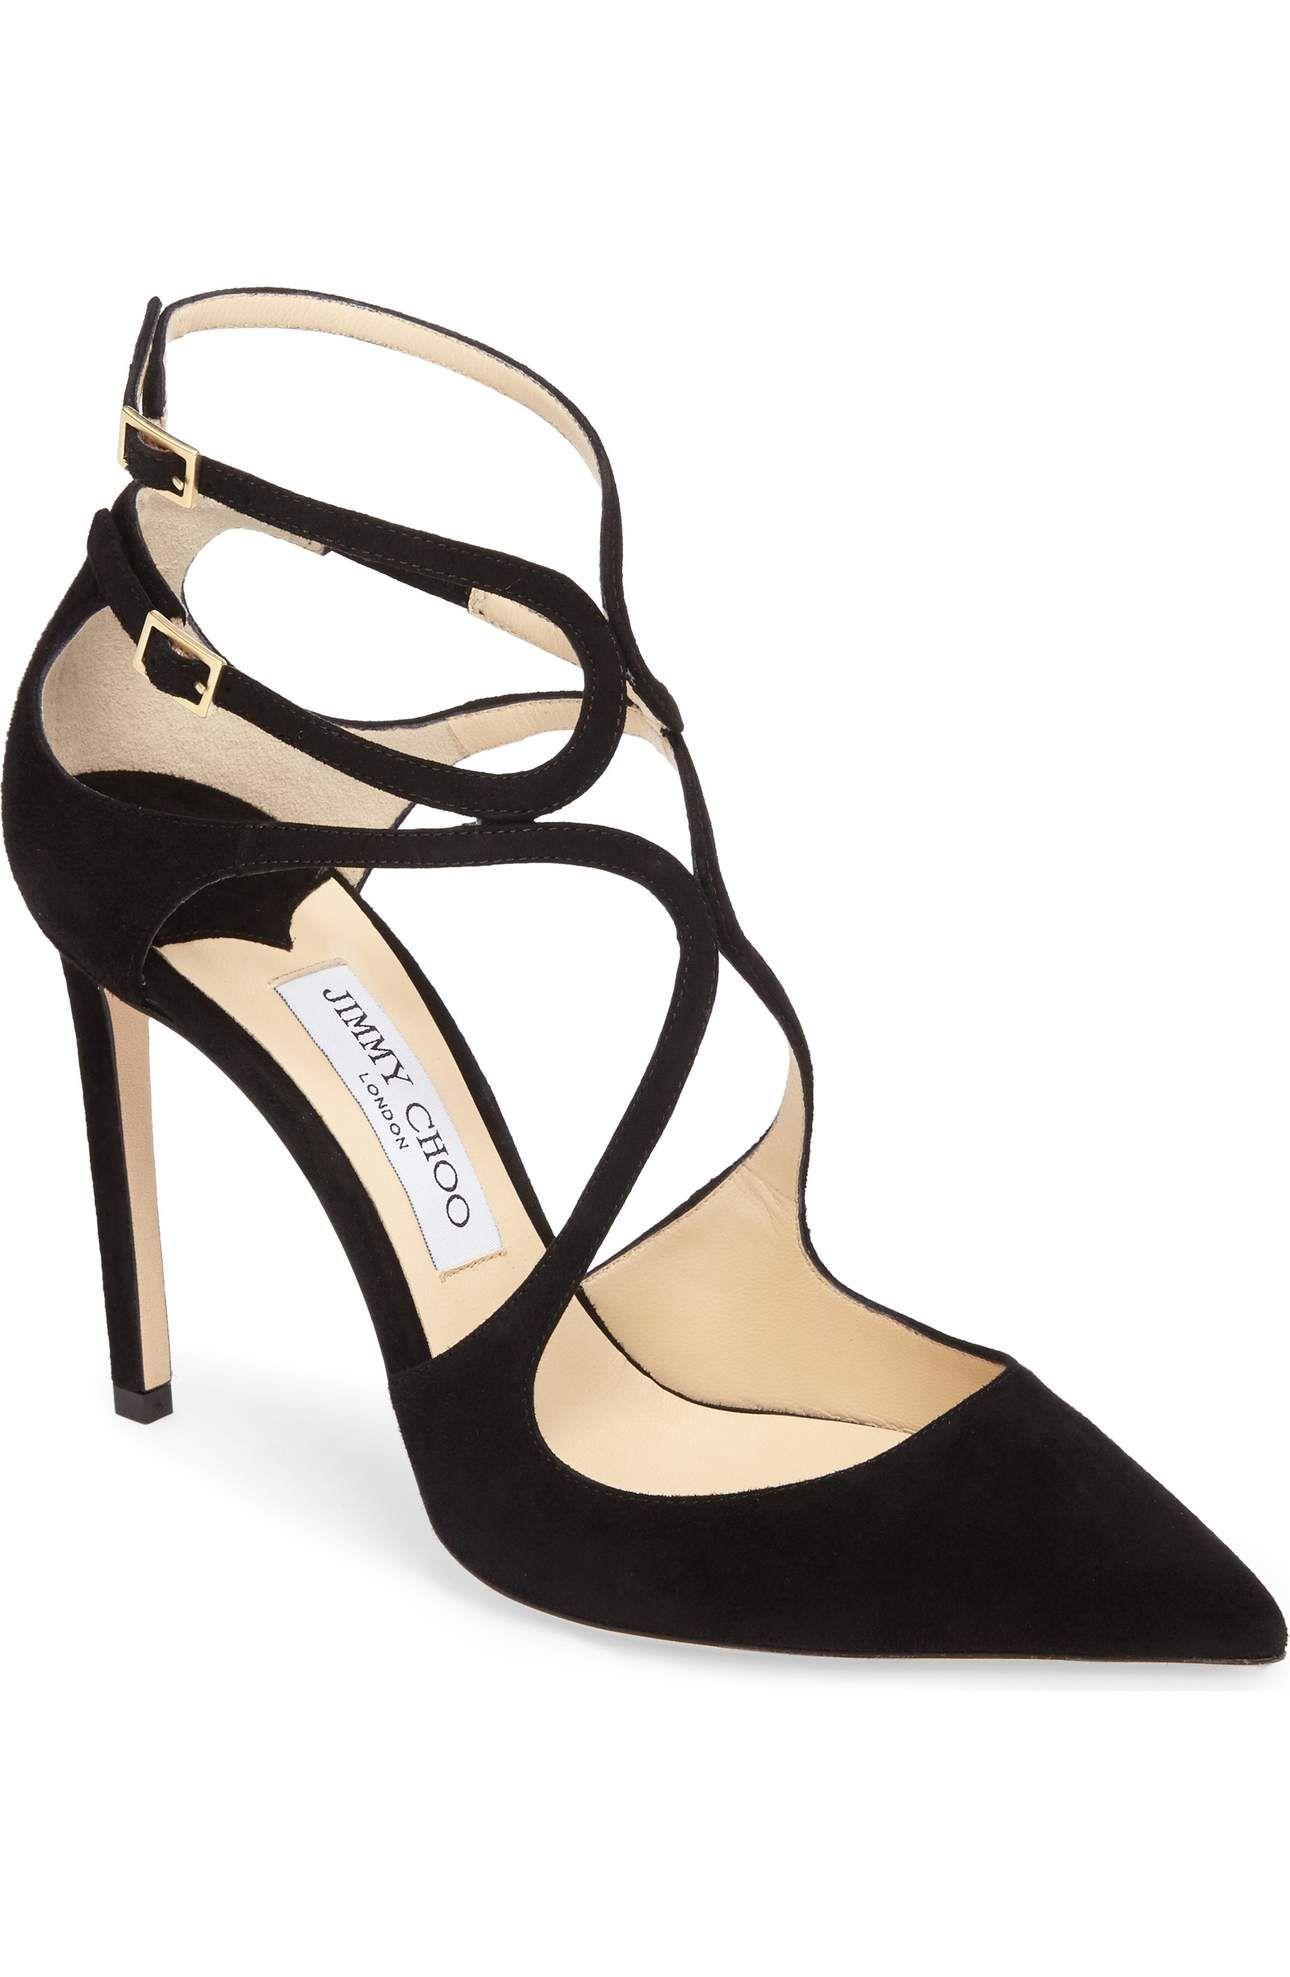 3bcfccc2c8b2 JIMMY CHOO Lancer Strappy Pump (Black)  weddingshoes